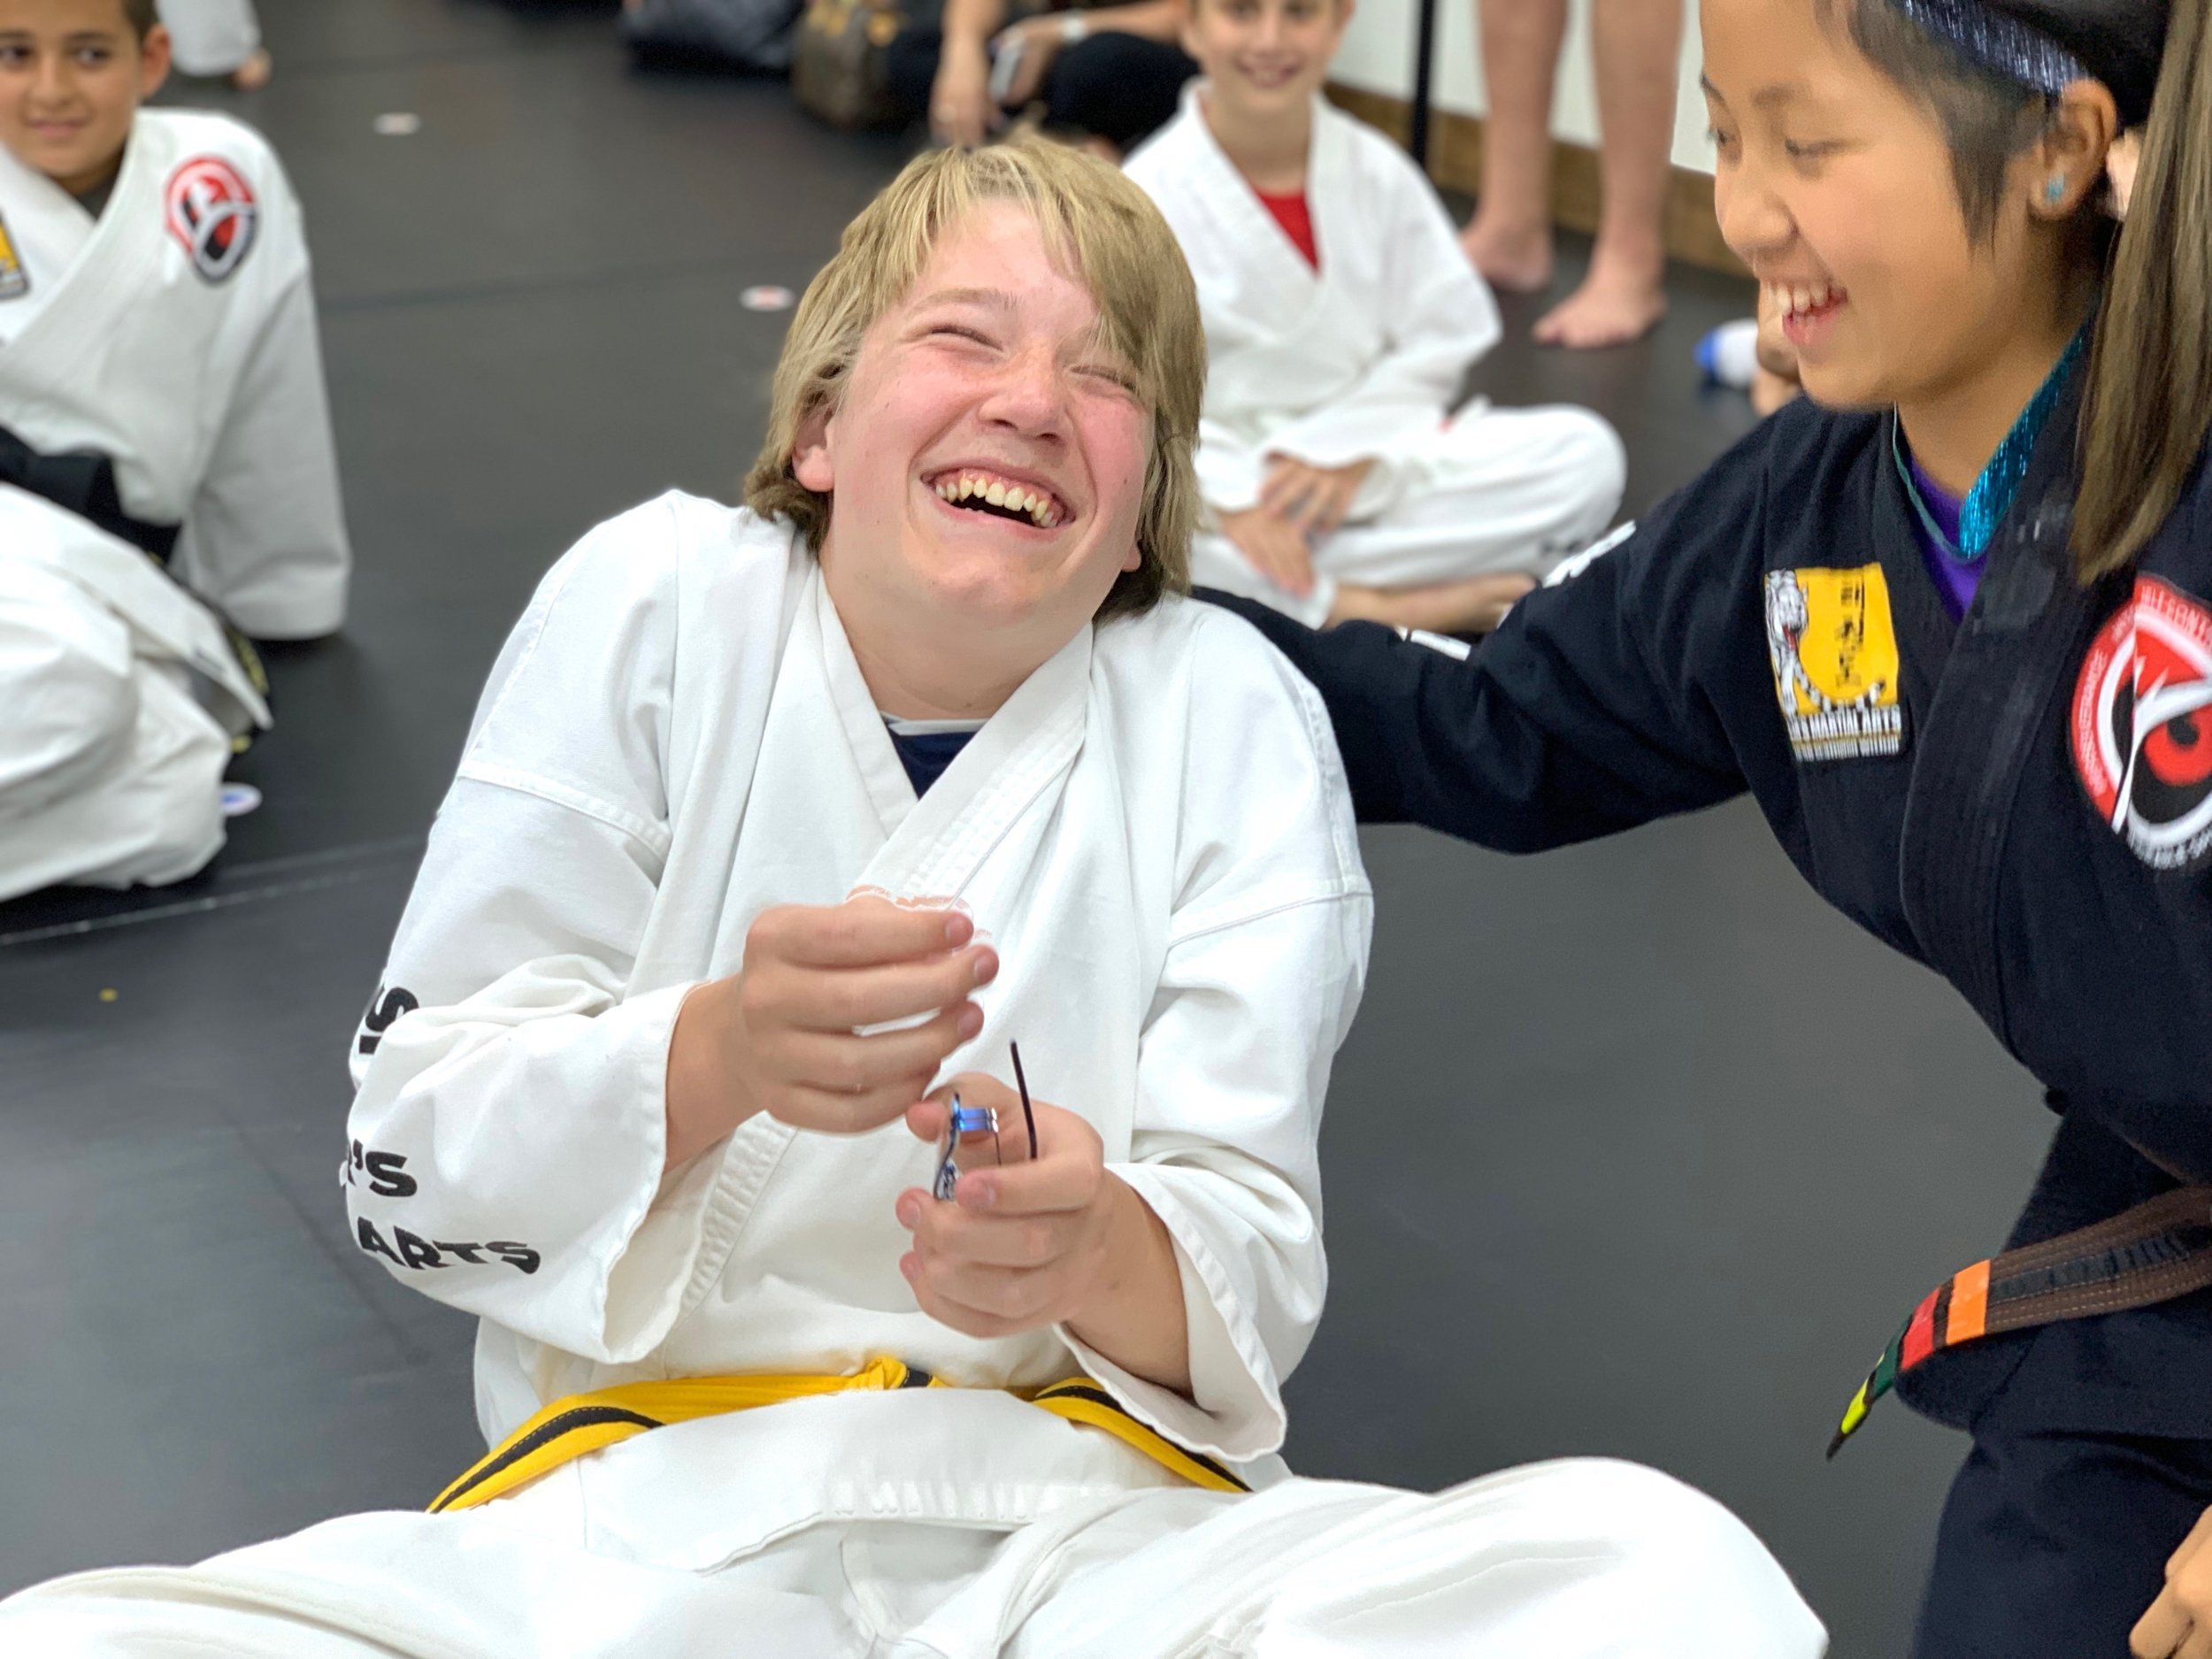 karate-kids-program-souhtlake-keller-grapevine-texas00029.jpeg